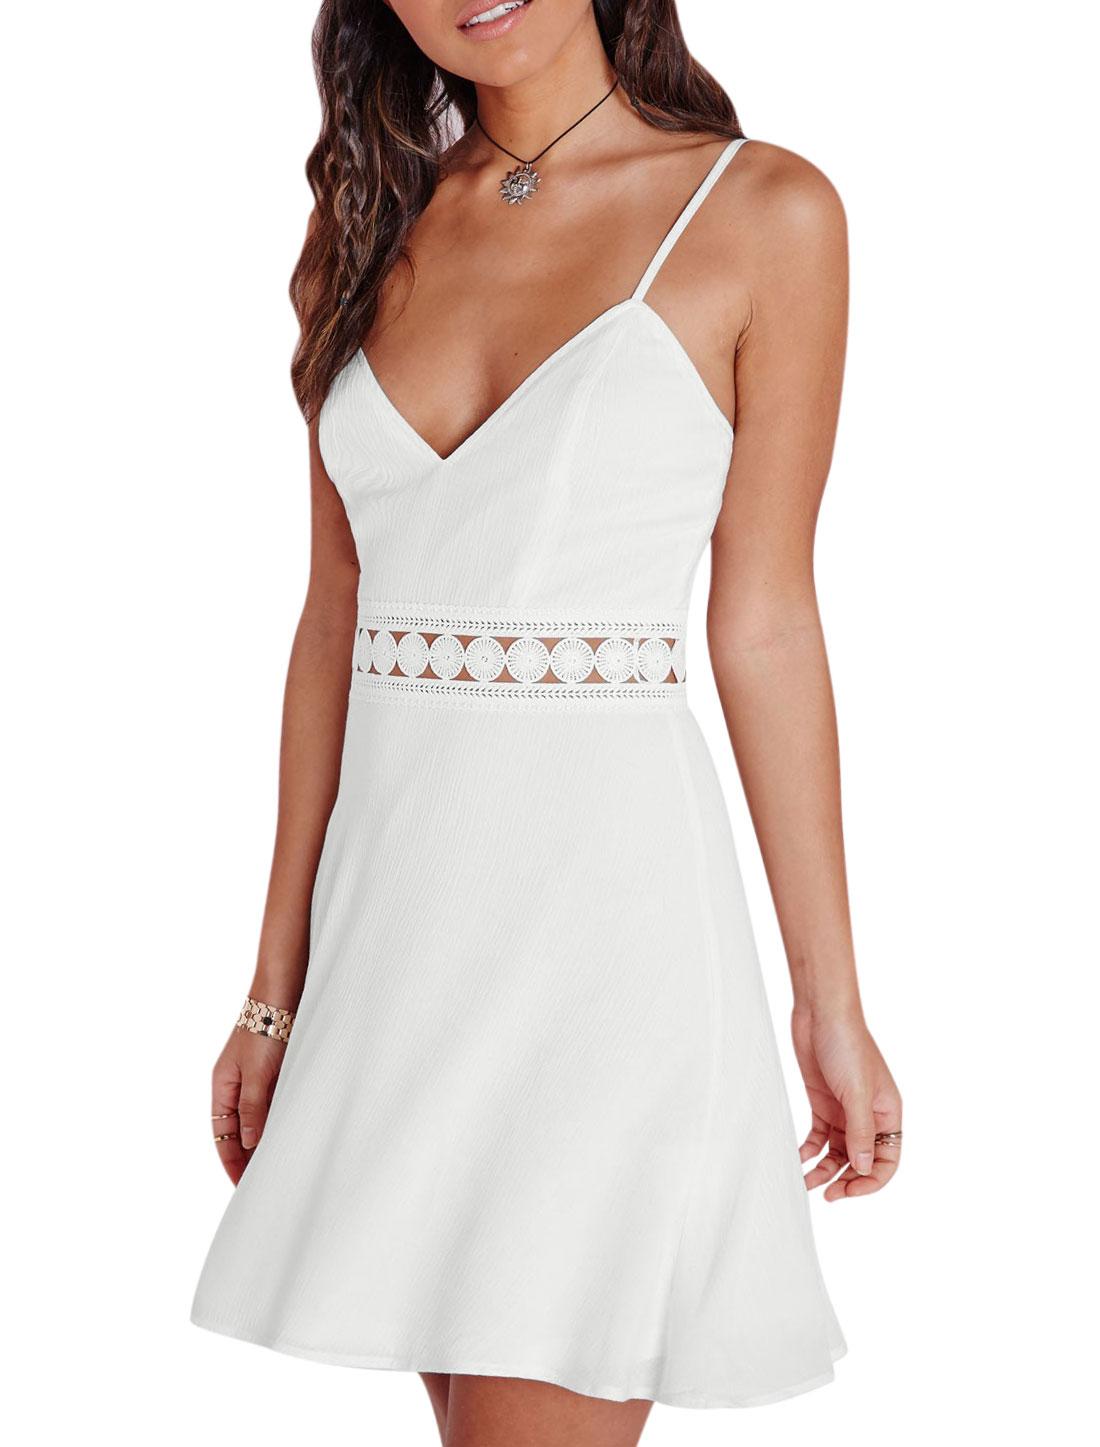 Women Deep V Neck Crochet Panel Hollow Out Cami Dress White M